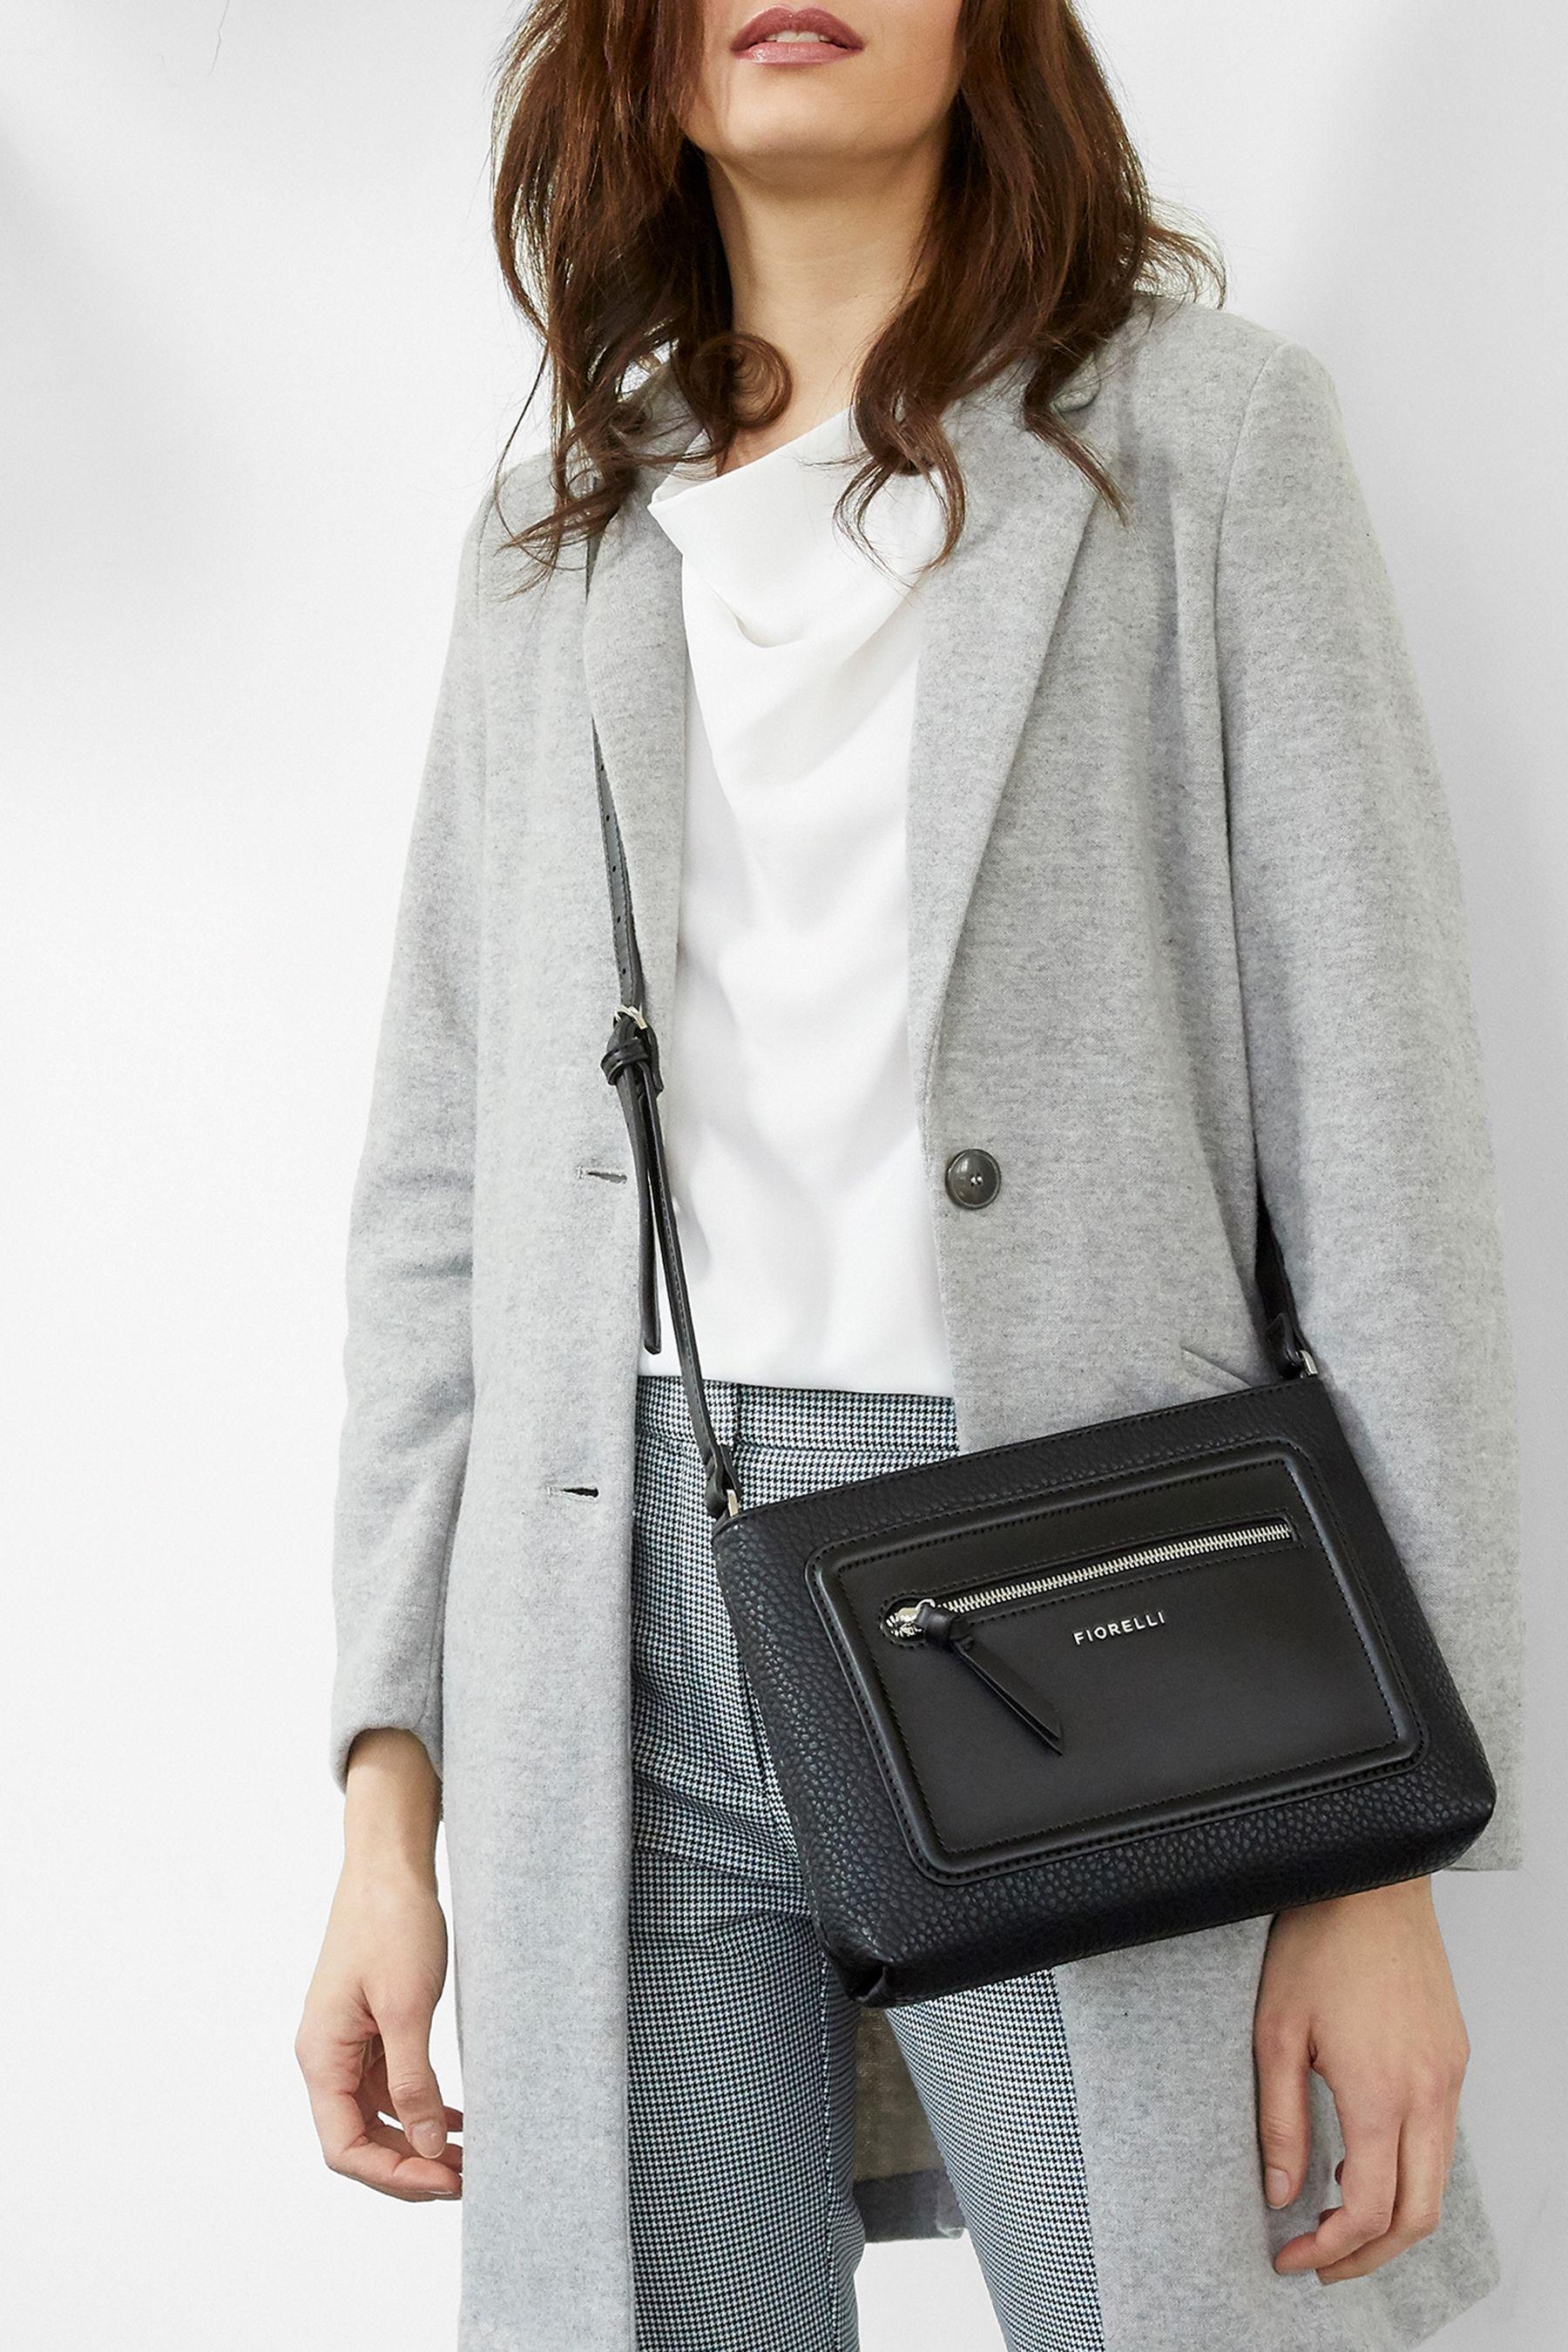 d4809bc491420 Womens Fiorelli Slim Crossbody Bag - Black in 2019 | Fiorelli ...